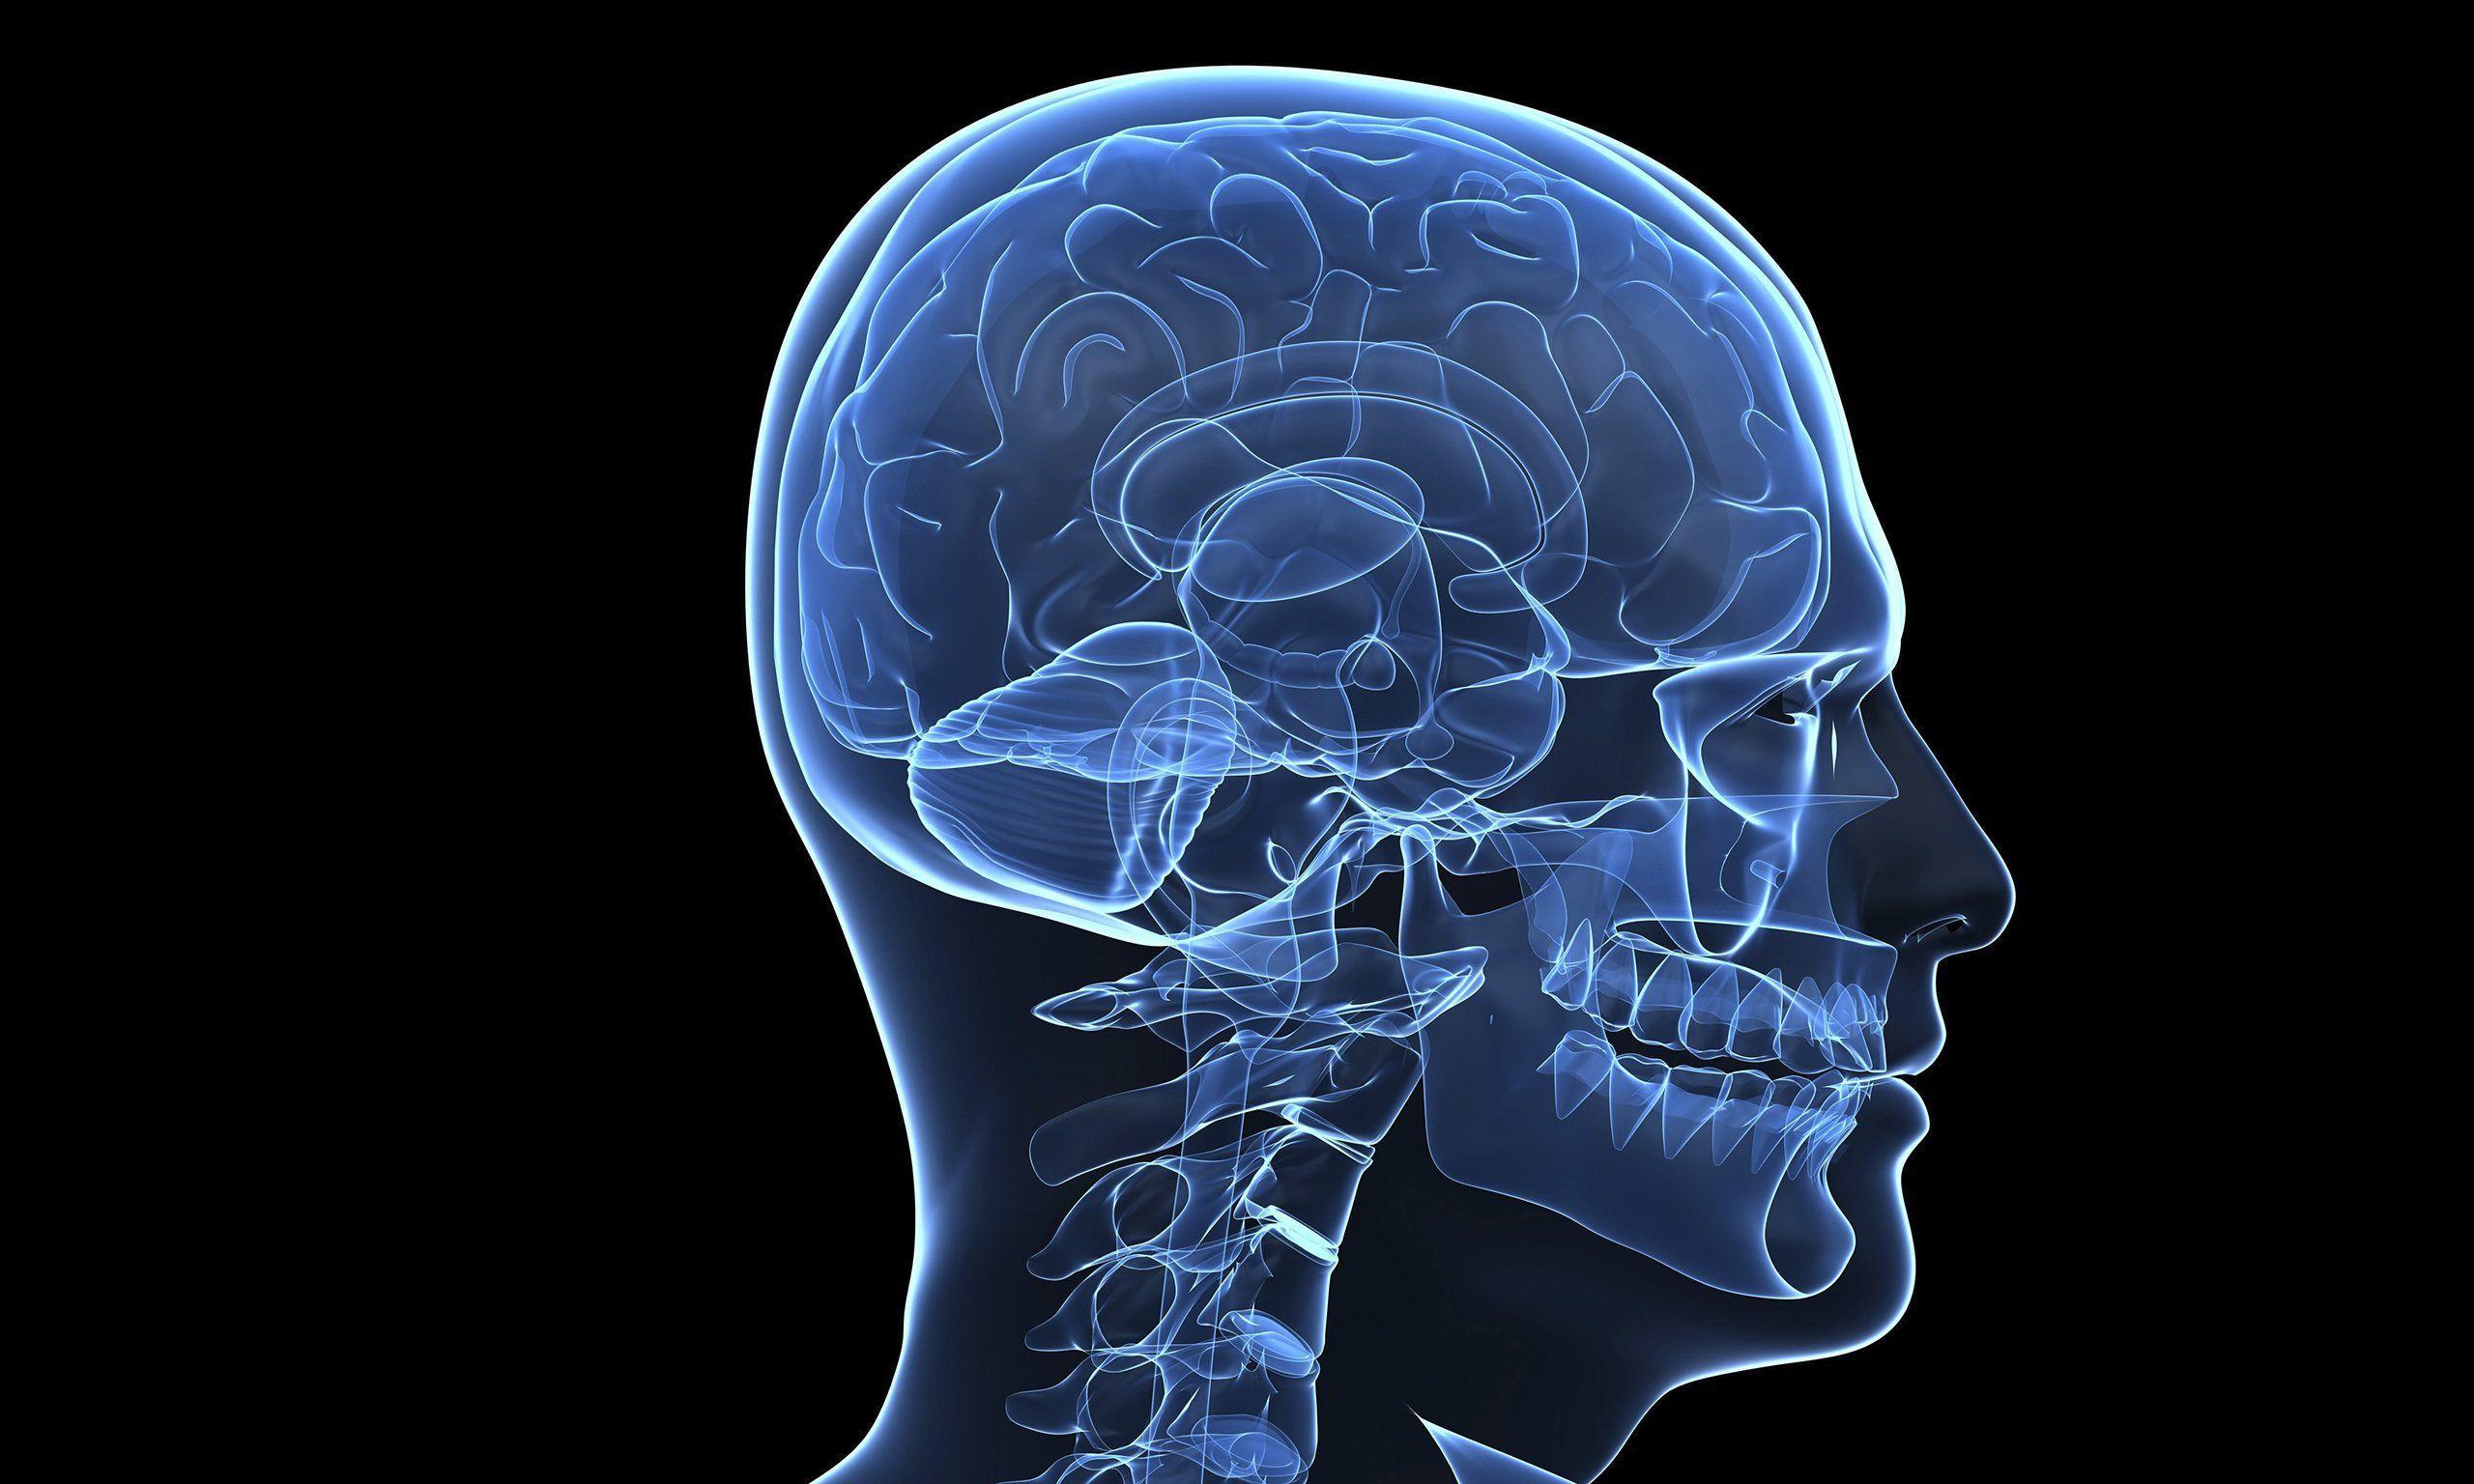 Brain Anatomy Wallpapers - Wallpaper Cave